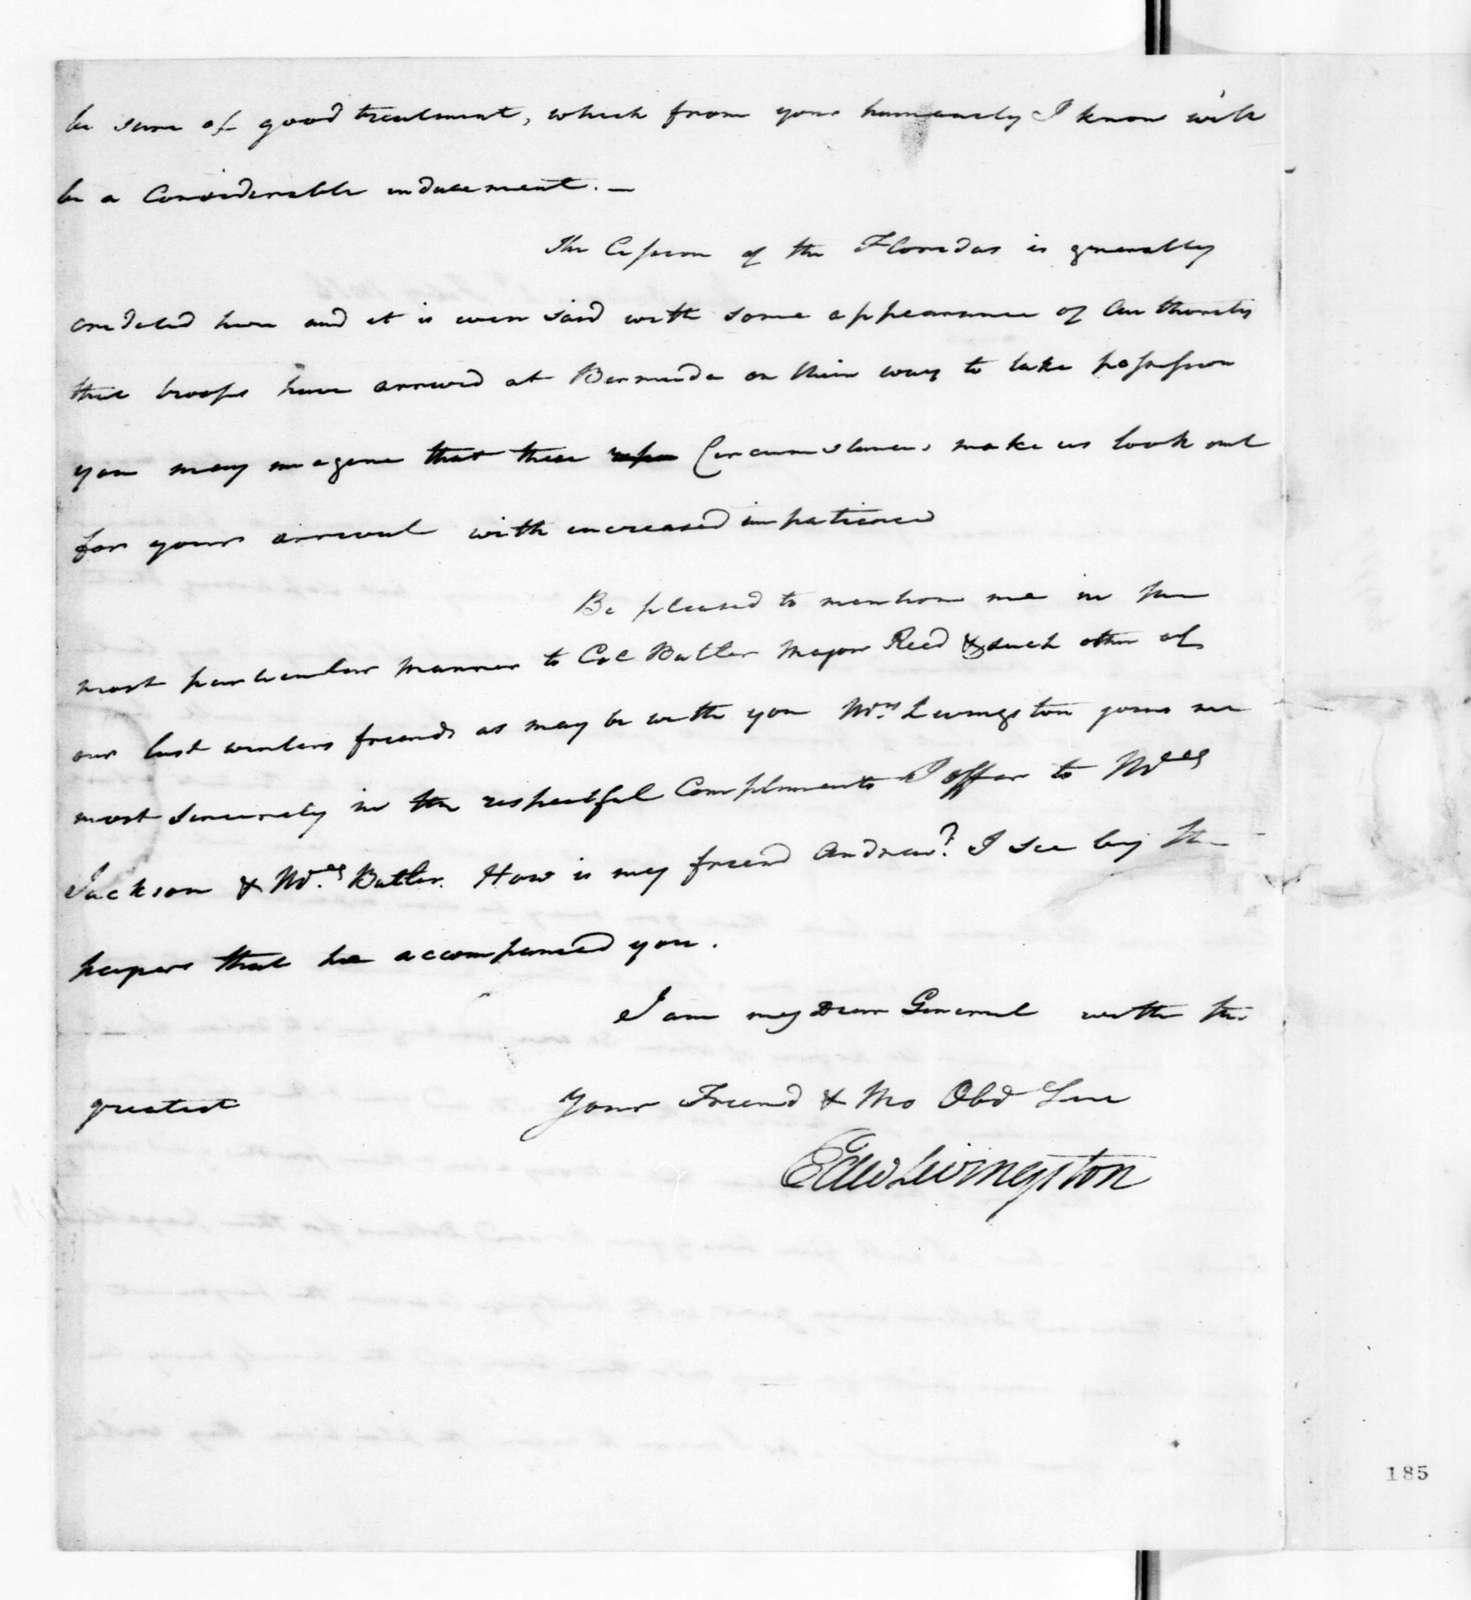 Edward Livingston to Andrew Jackson, February 2, 1816